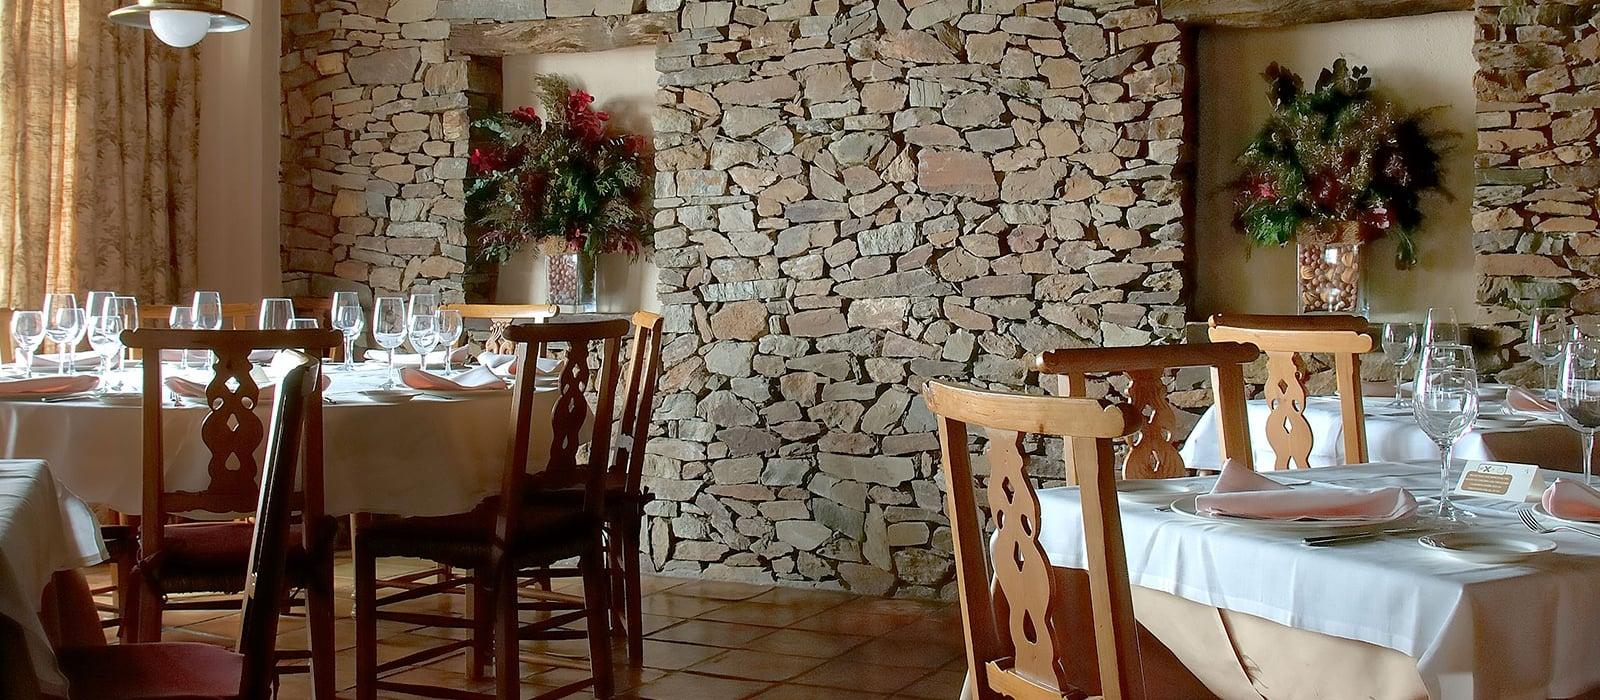 Servizi Rumaykiyya Hotel Sierra Nevada - Vincci Hoteles